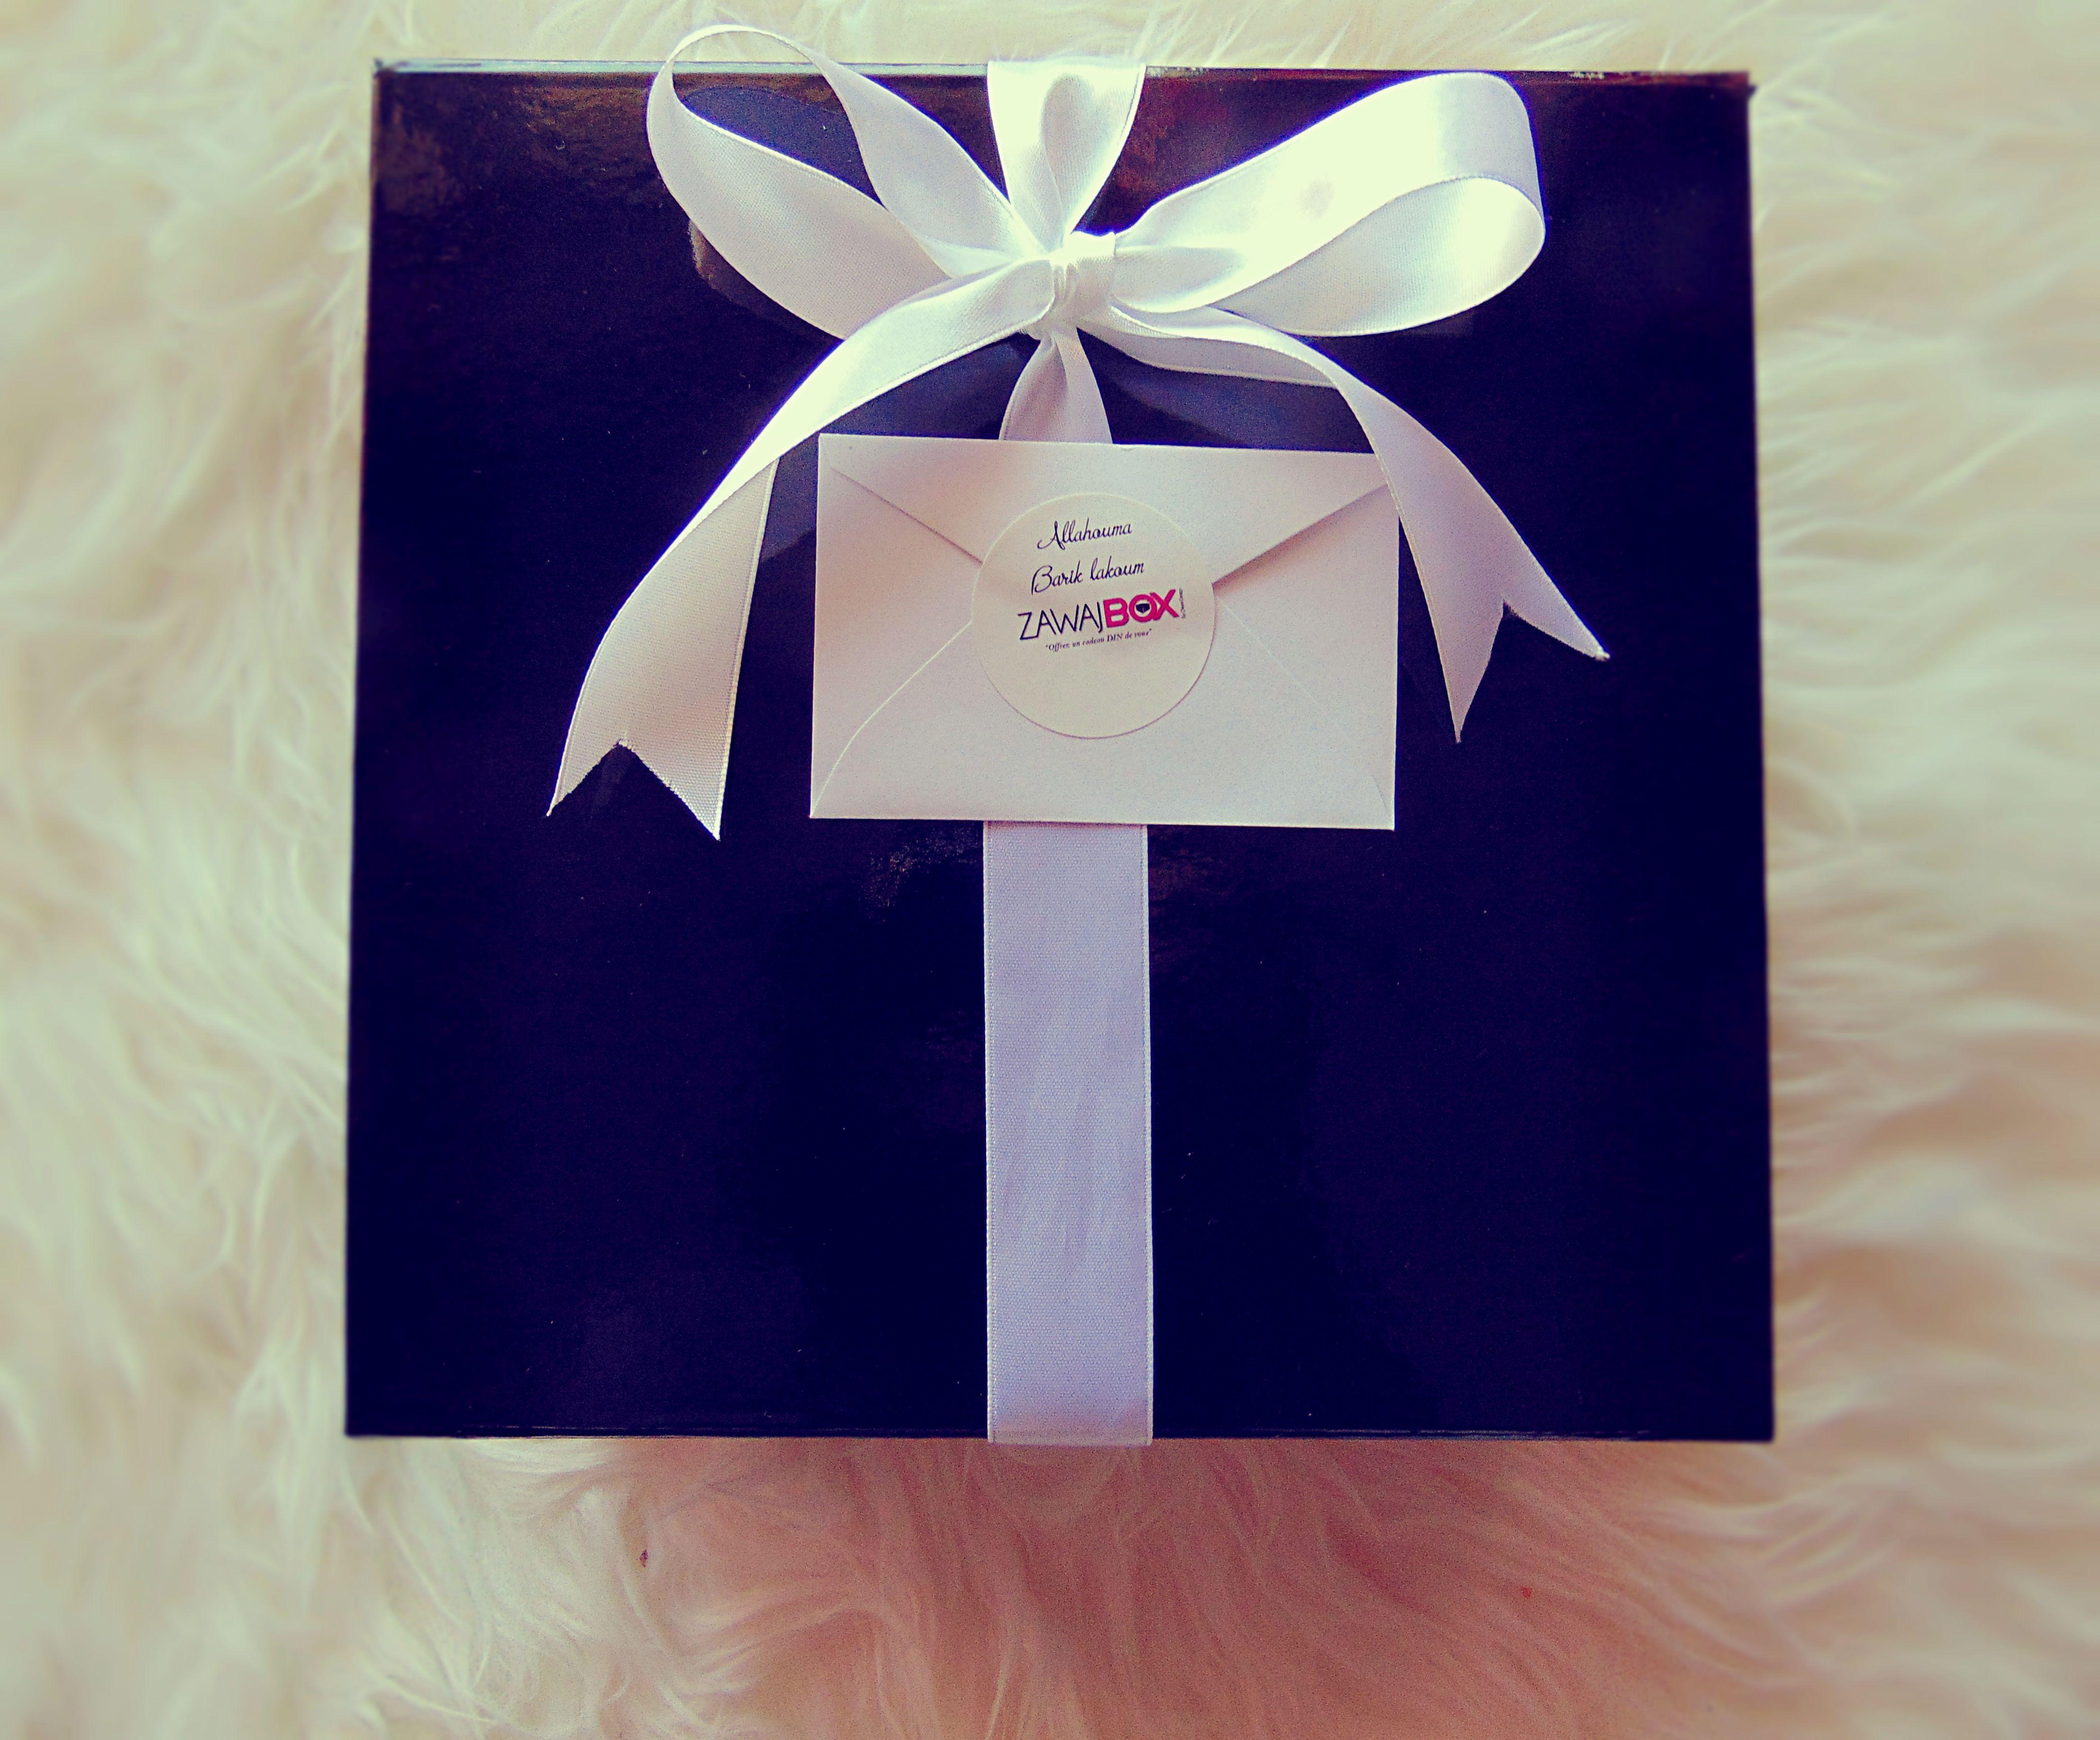 Häufig coffret zawajbox cadeau musulman classe raffiné muslim lovers | La  OK11